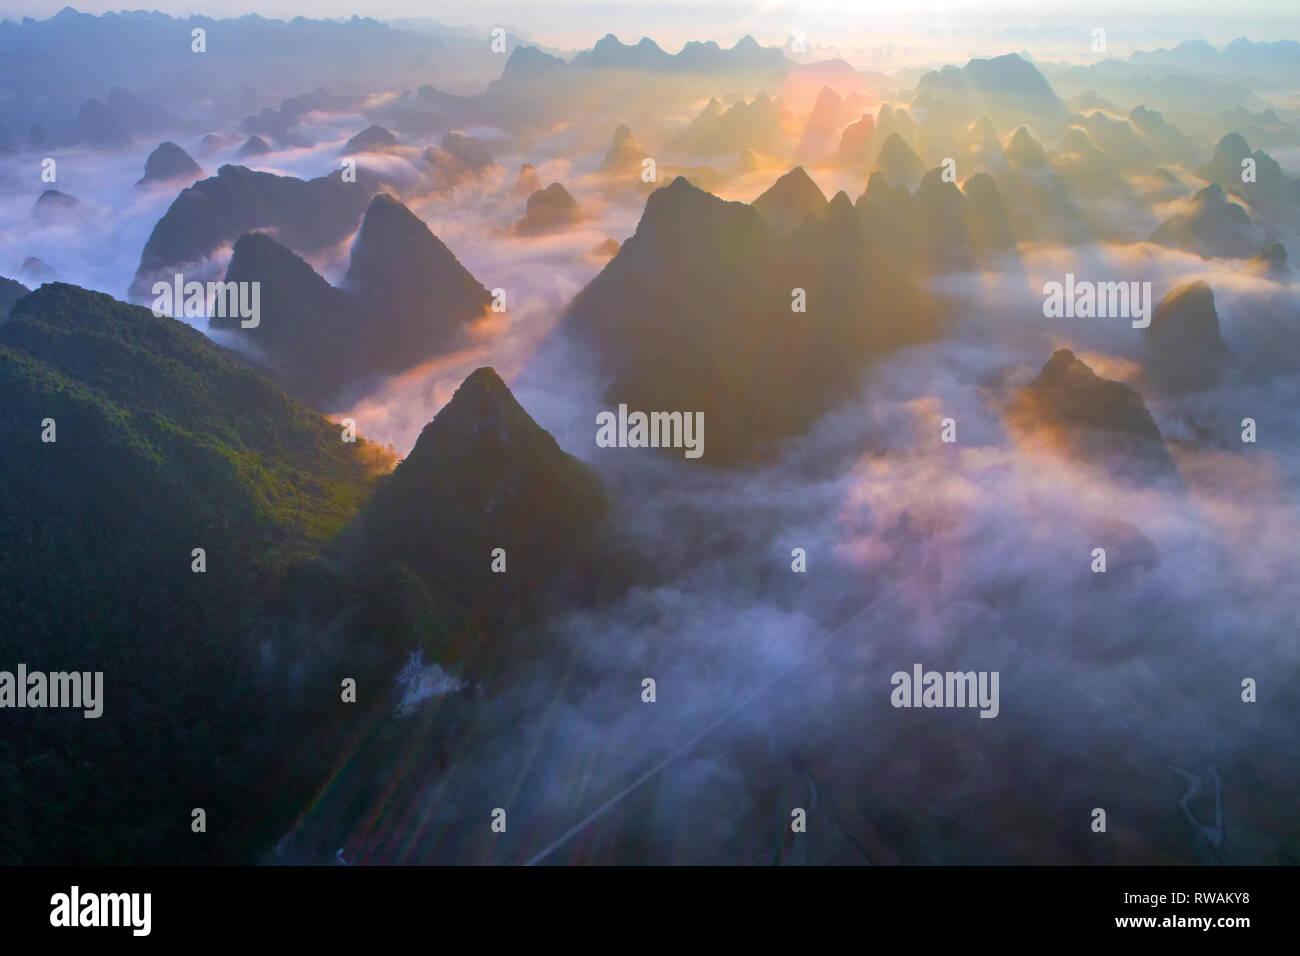 Aerial view of dawn on mountain at Ngoc Con ward, Trung Khanh town, Cao Bang province, Vietnam - Stock Image